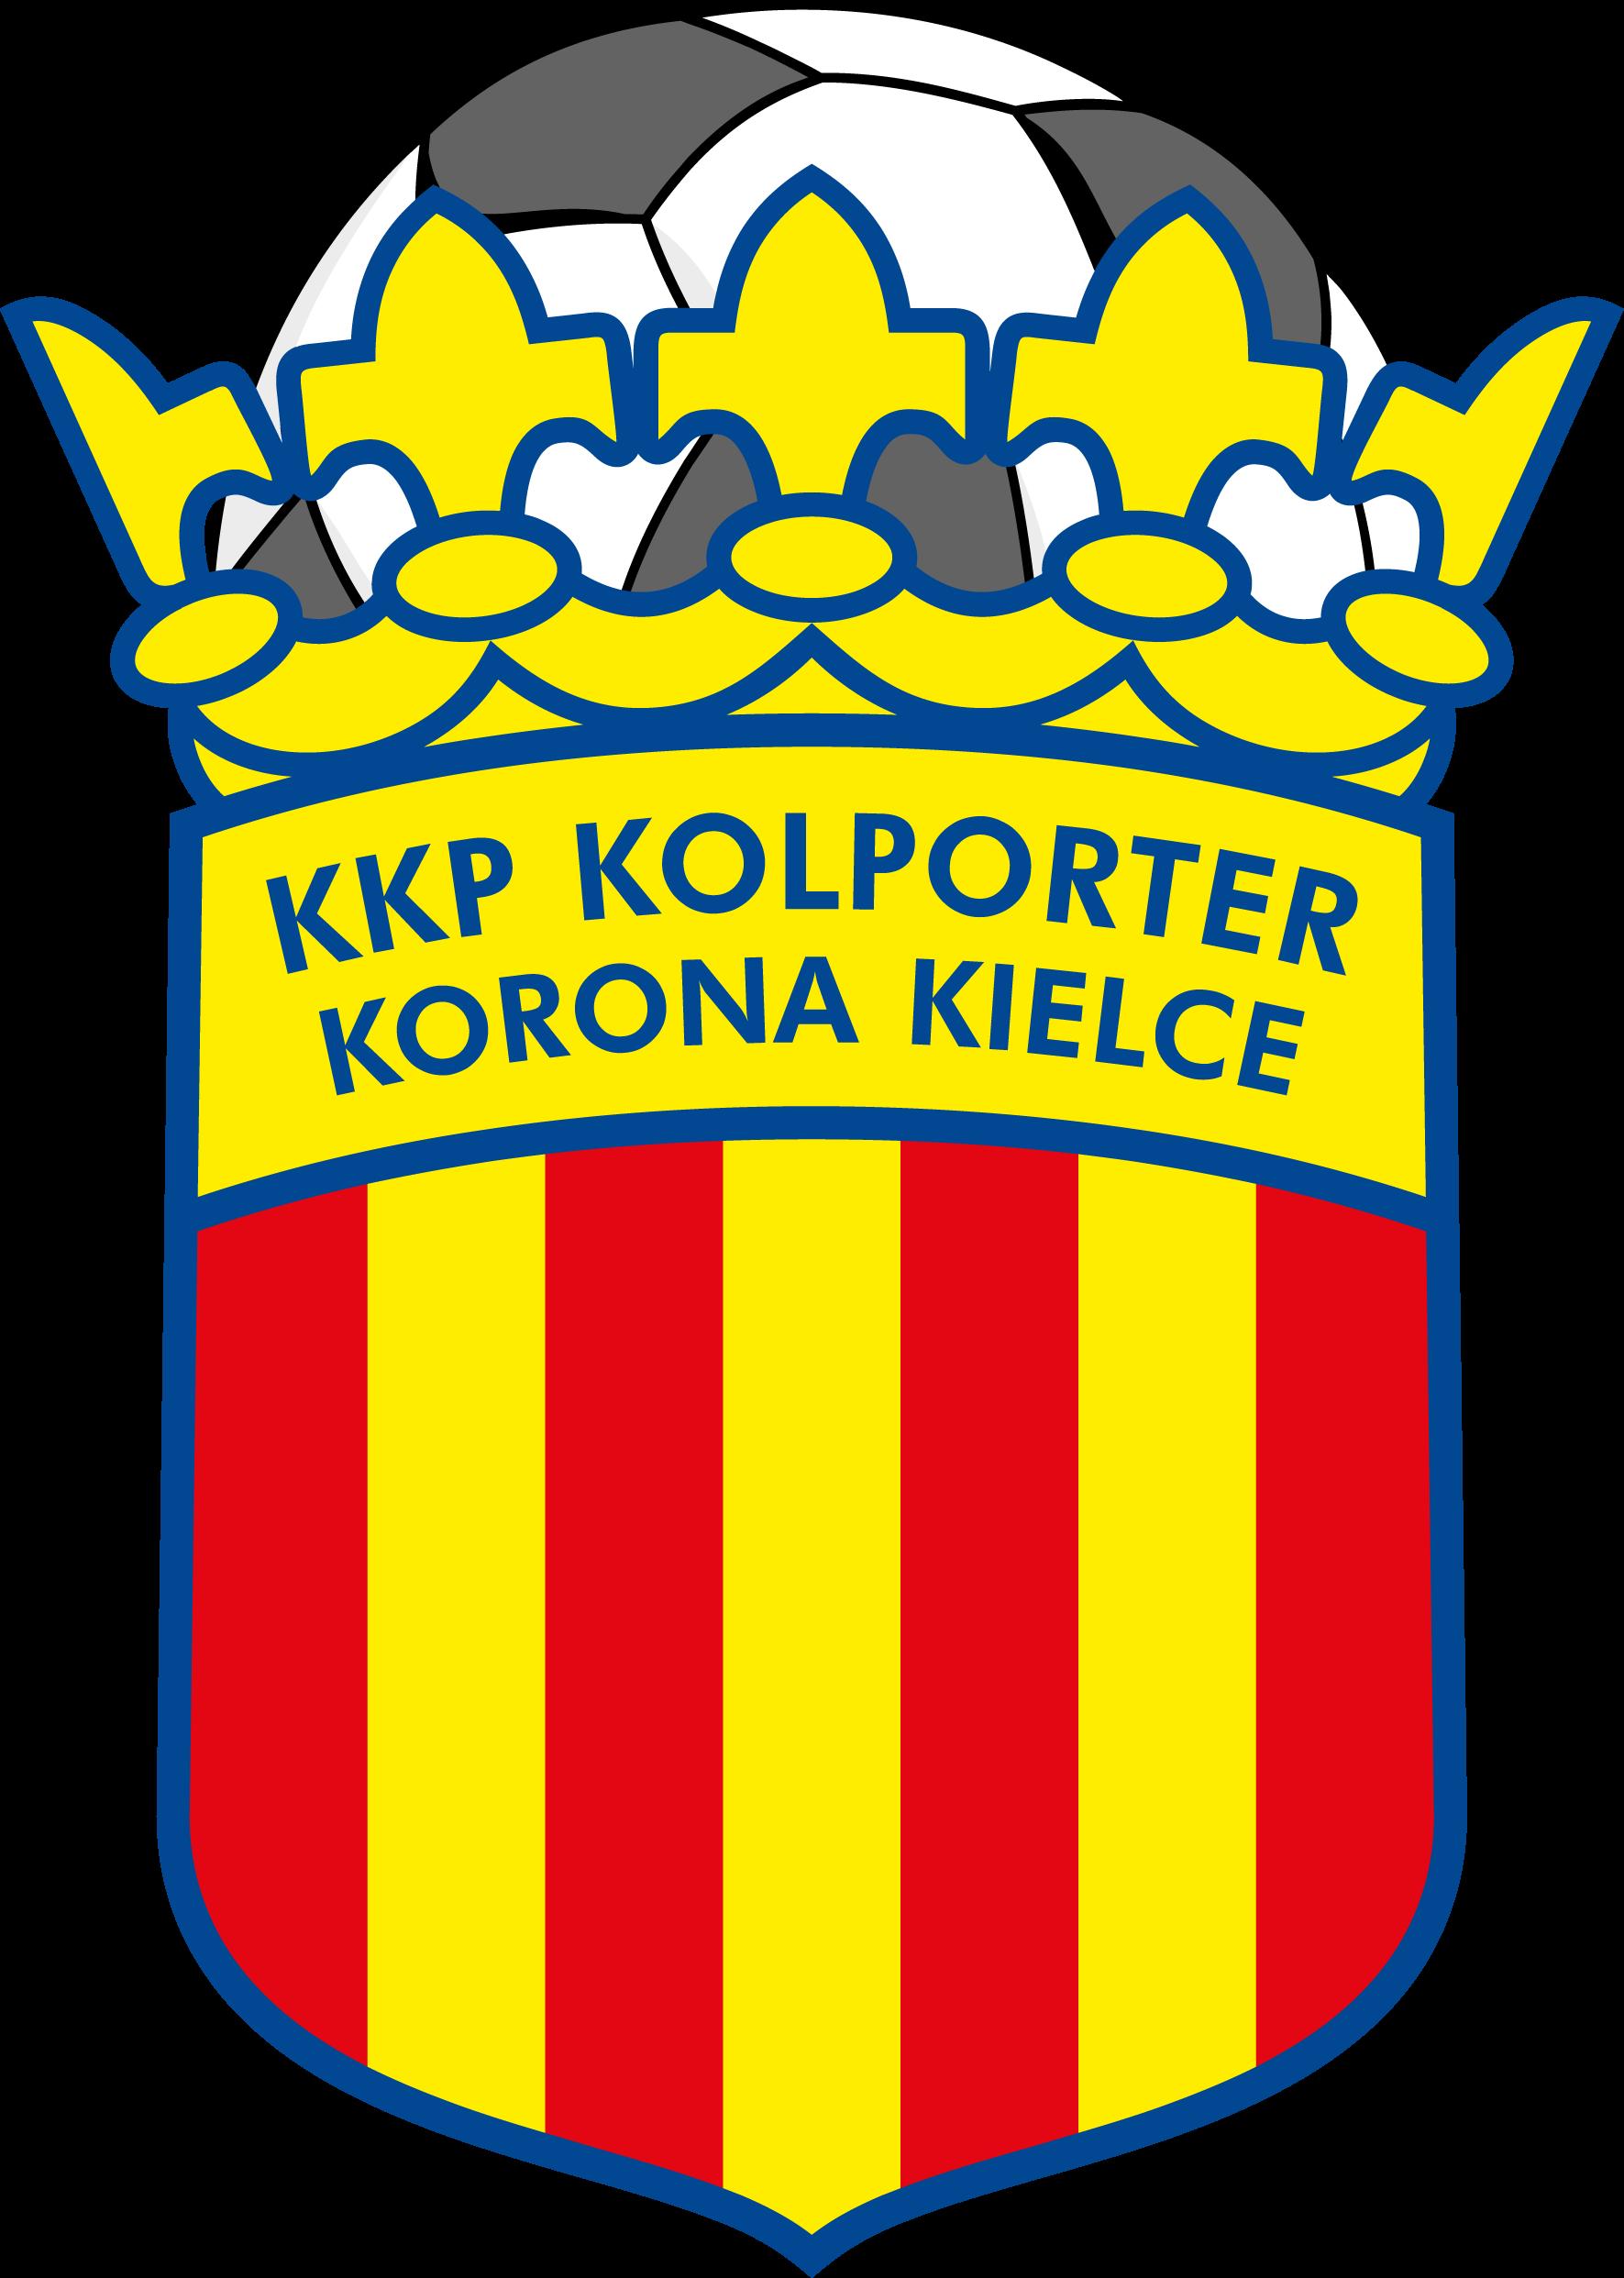 KKP Kolporter Korona Kielce